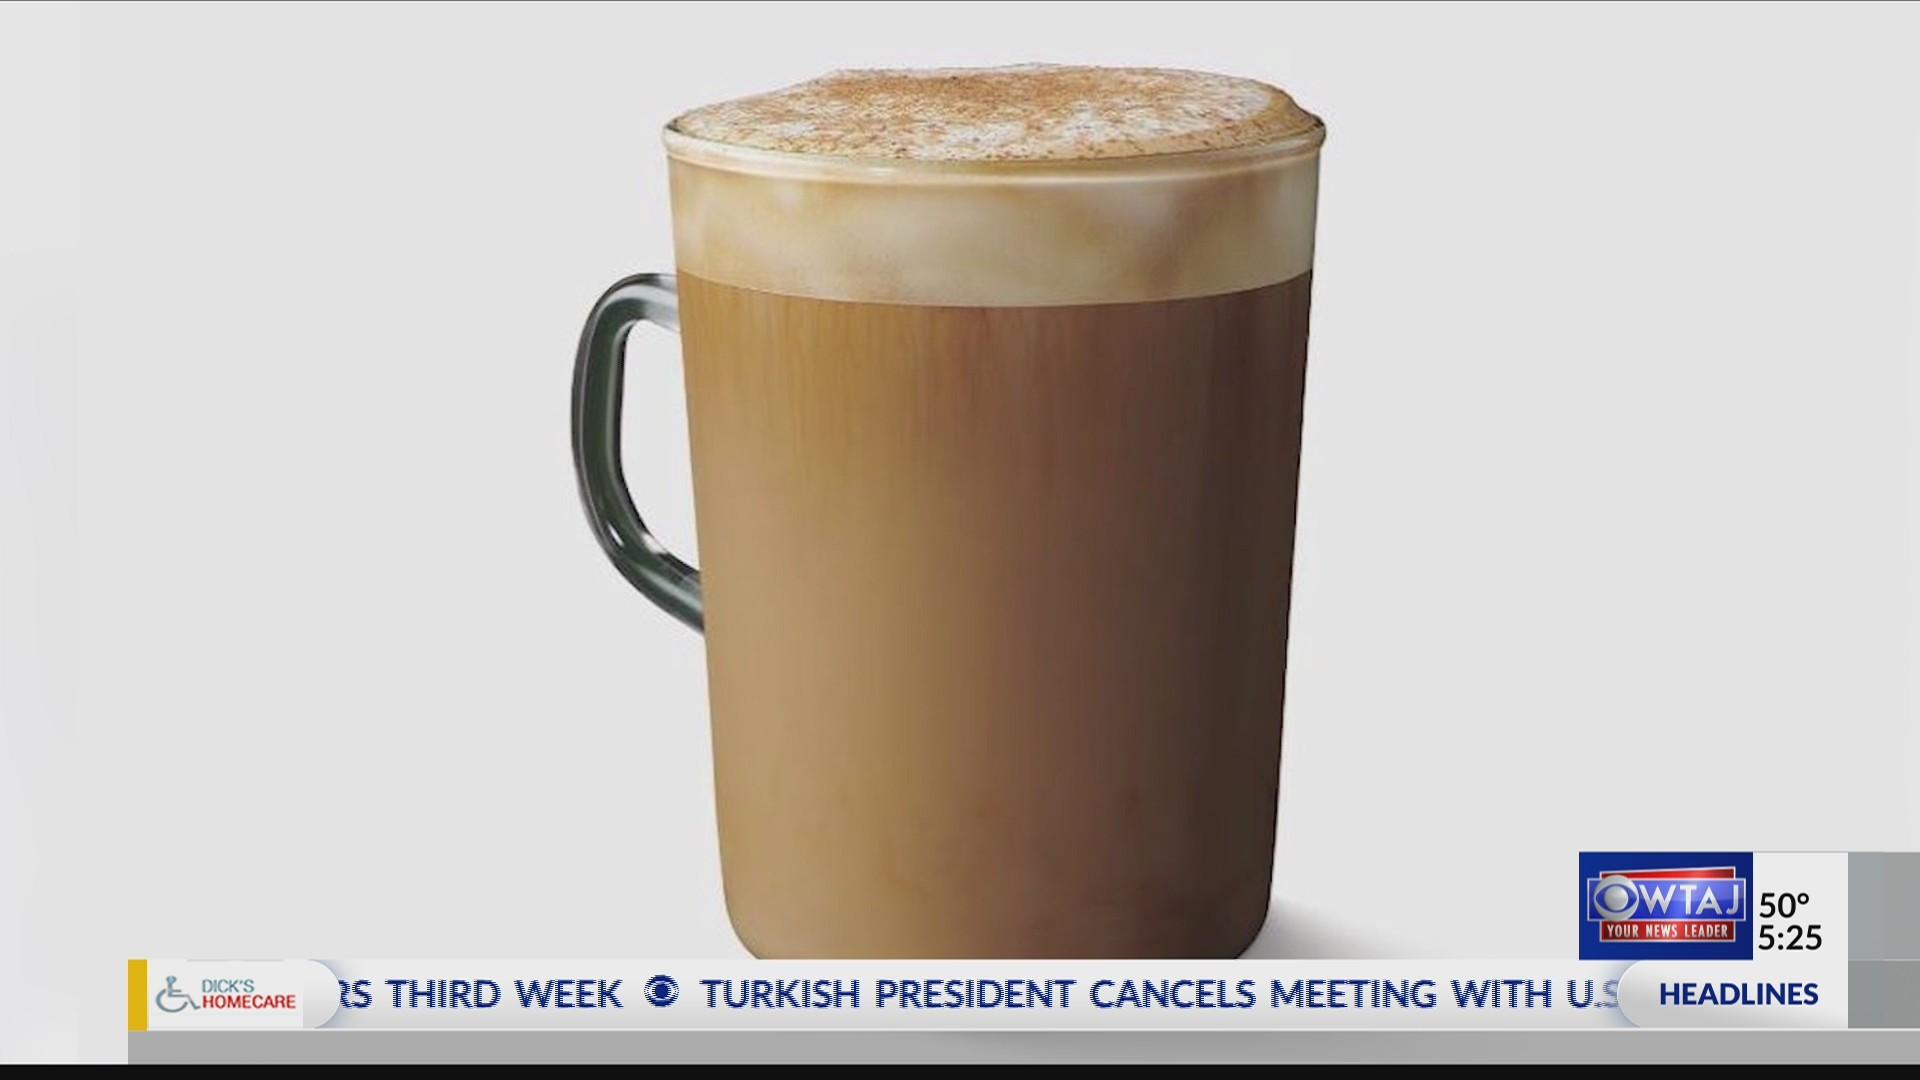 New_Starbucks_Drink_0_20190109031714